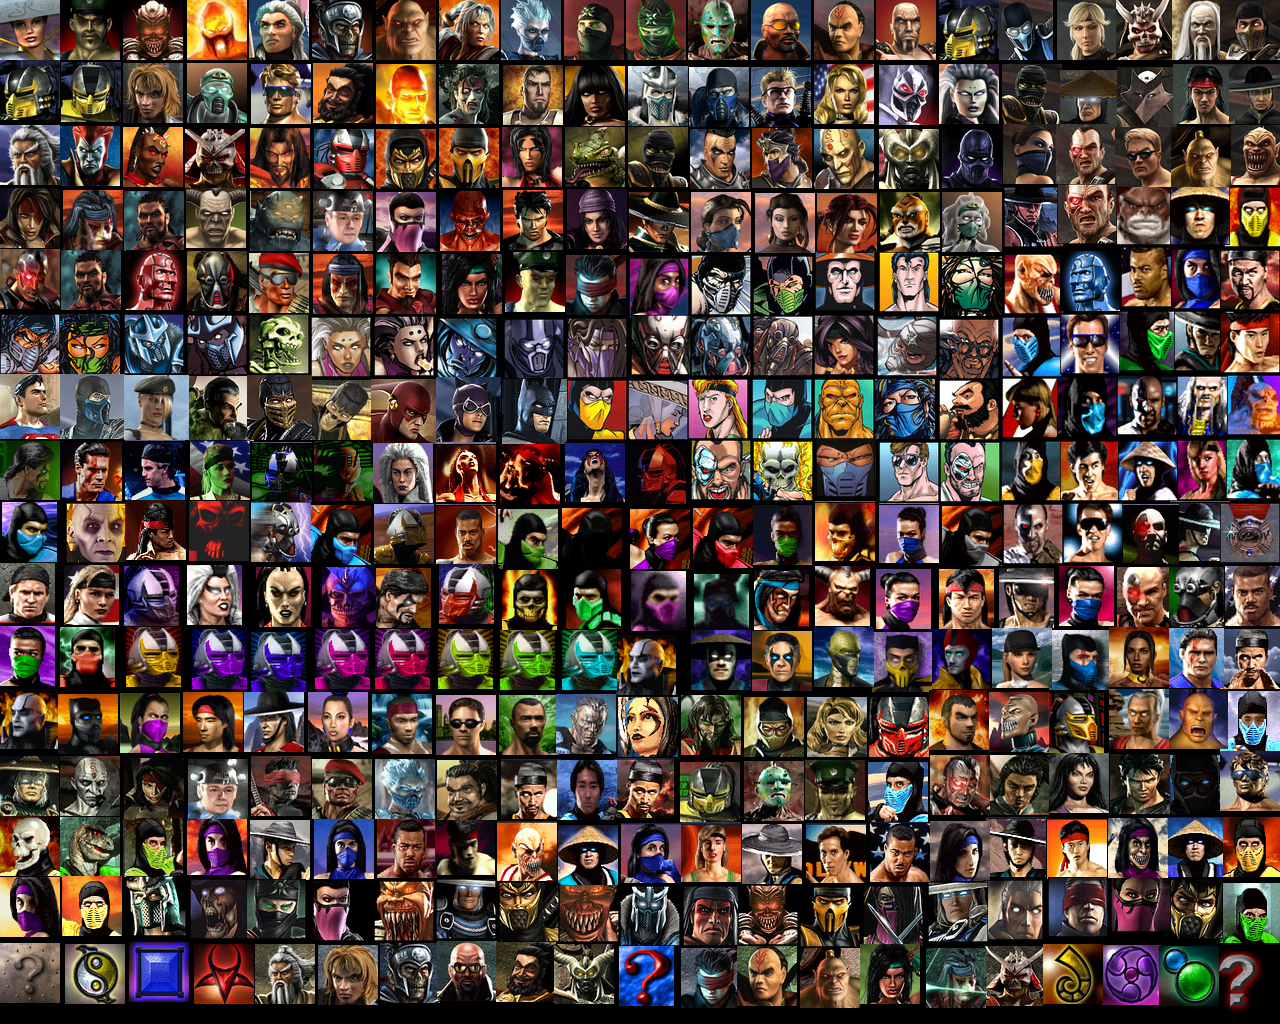 [48+] Yellow Wallpaper Character List on WallpaperSafari